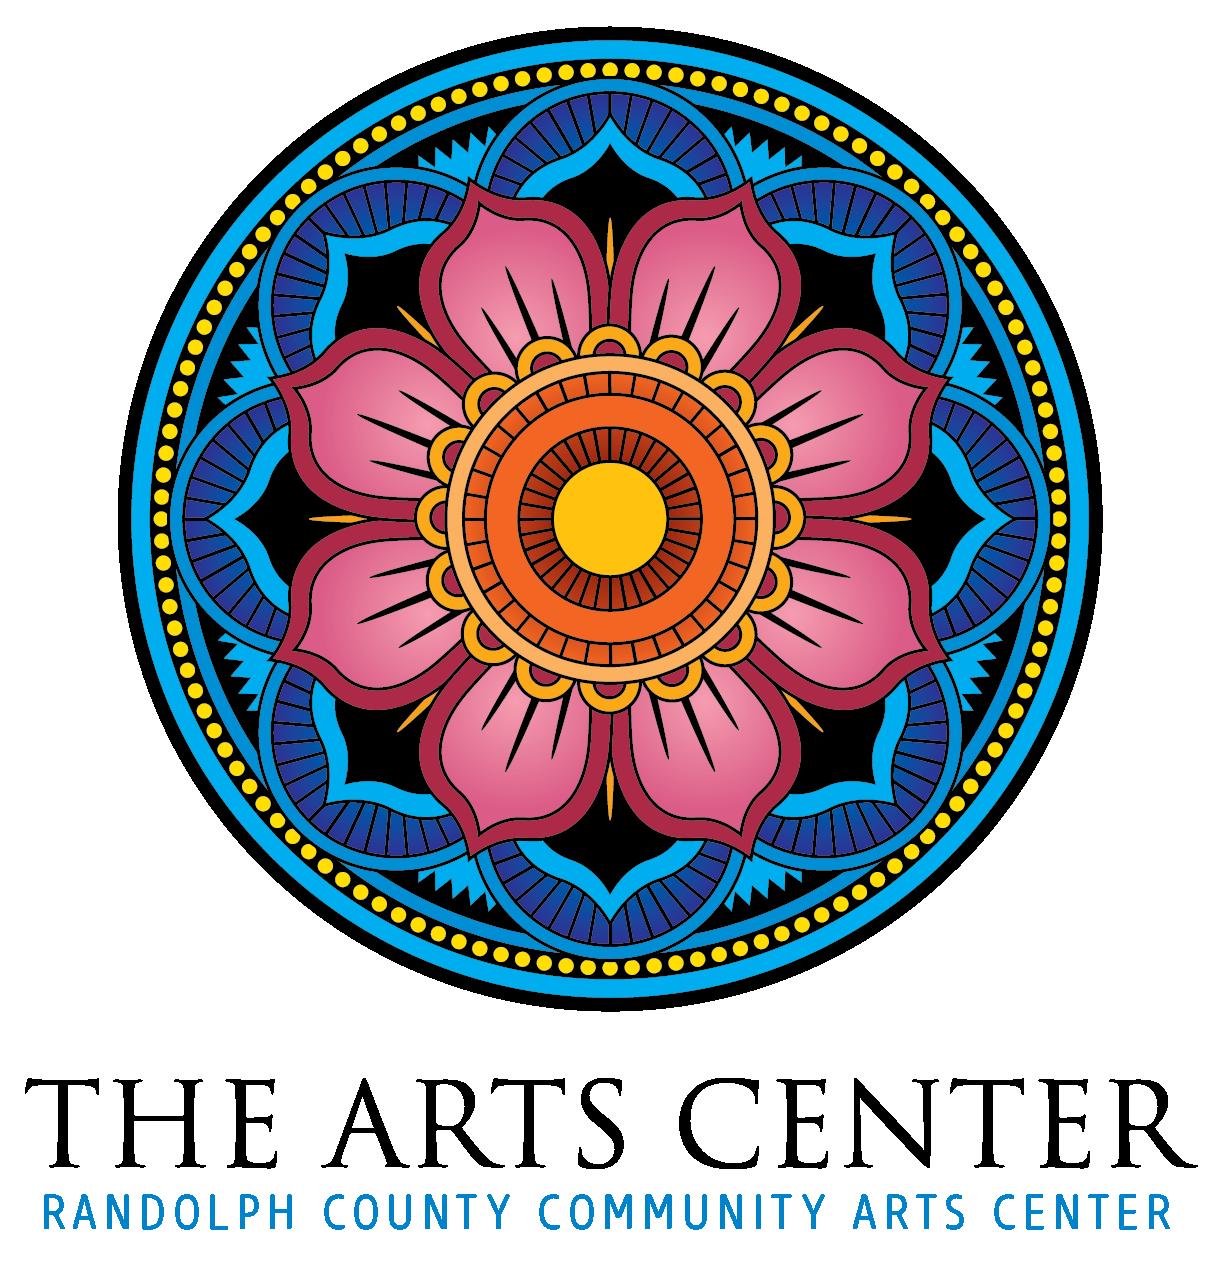 Randolph County Community Arts Center